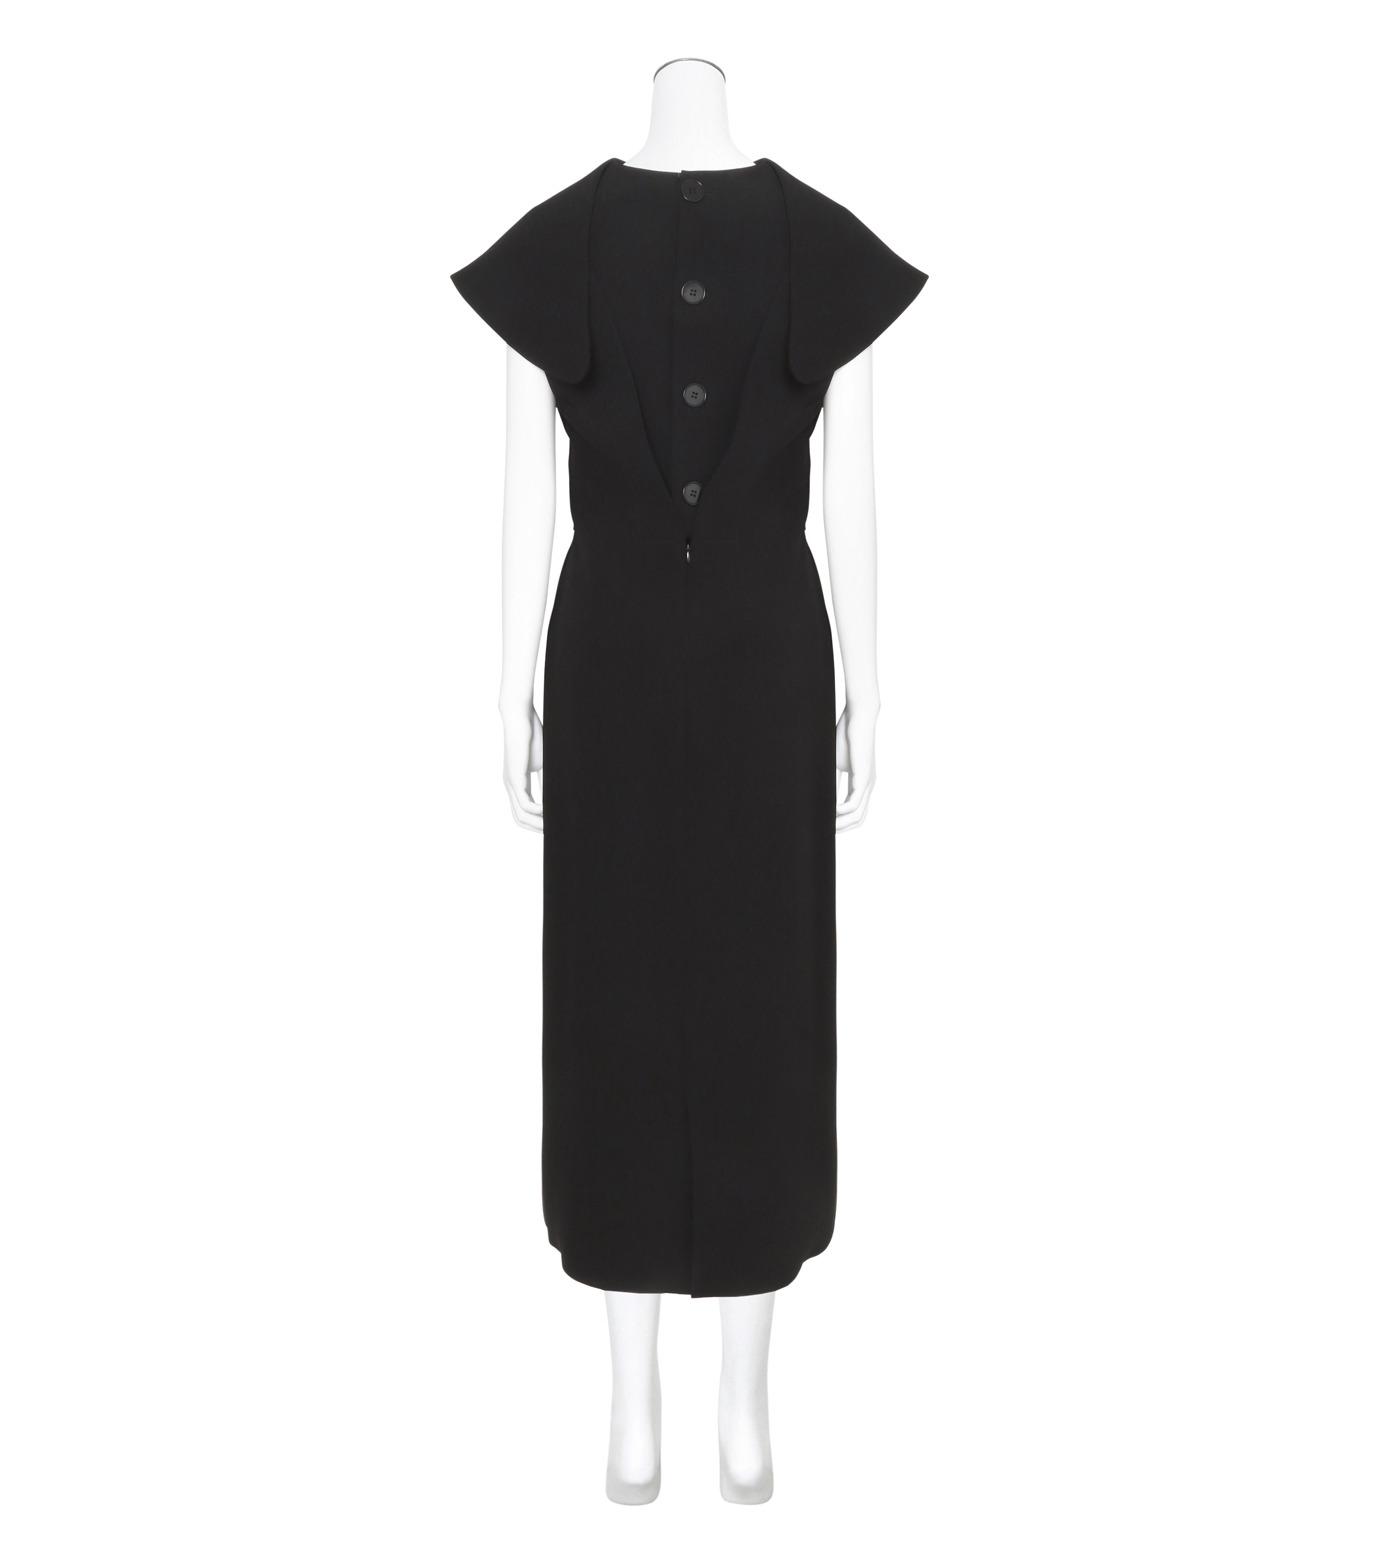 J.W.Anderson(ジェイダブリュー アンダーソン)のDeconstructed Dress-BLACK(ワンピース/one piece)-DR16-13 拡大詳細画像2